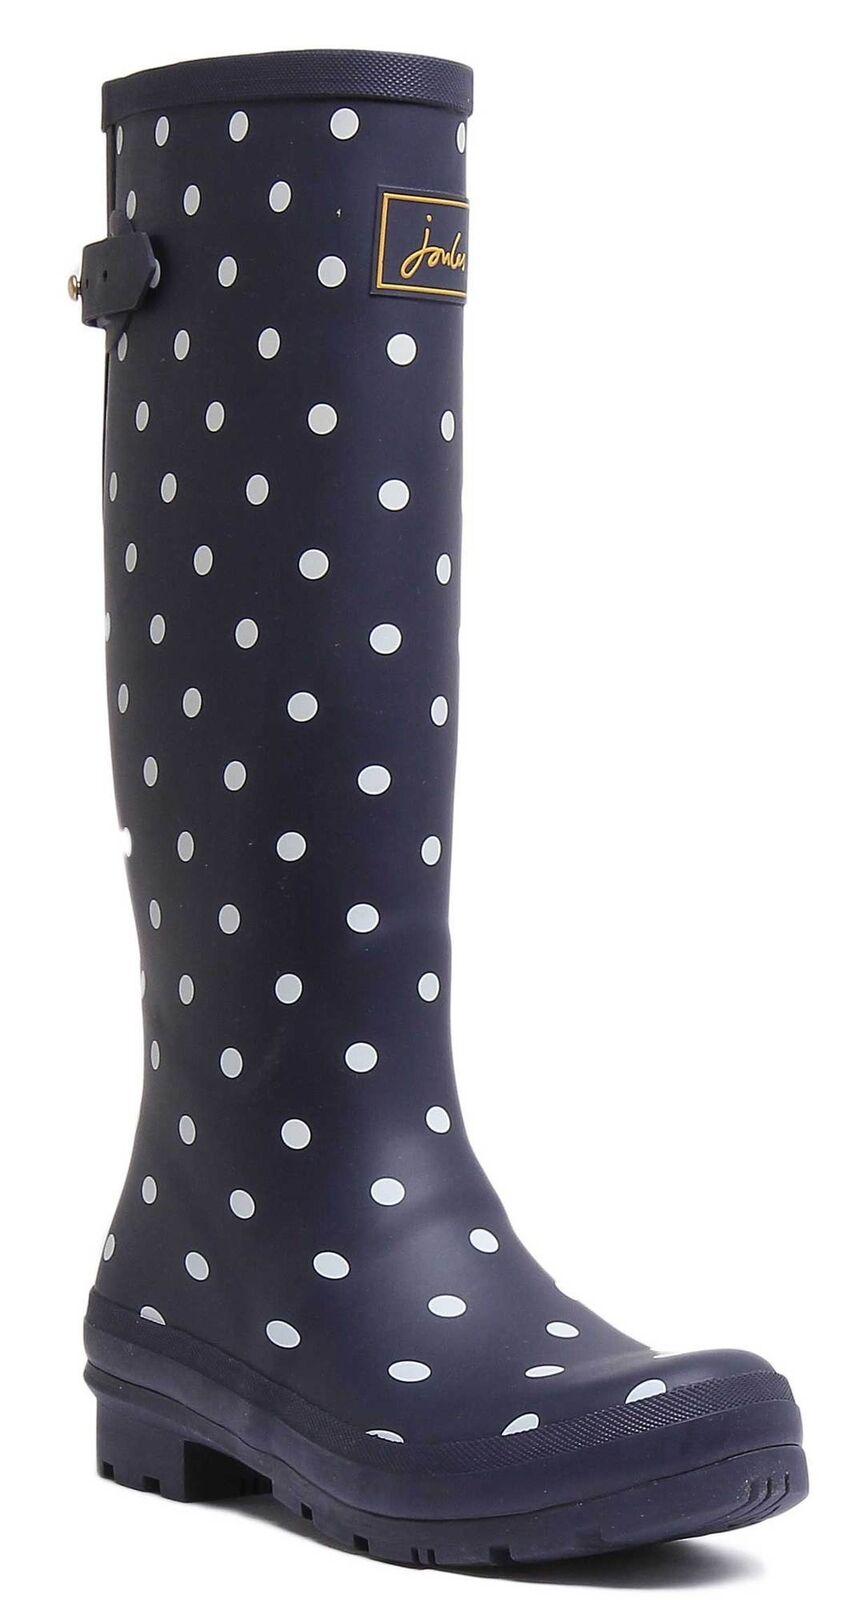 Joules Printed Wellies Adjustable Gusset damen Rubber Navy Stiefel UK Größe 3 - 8